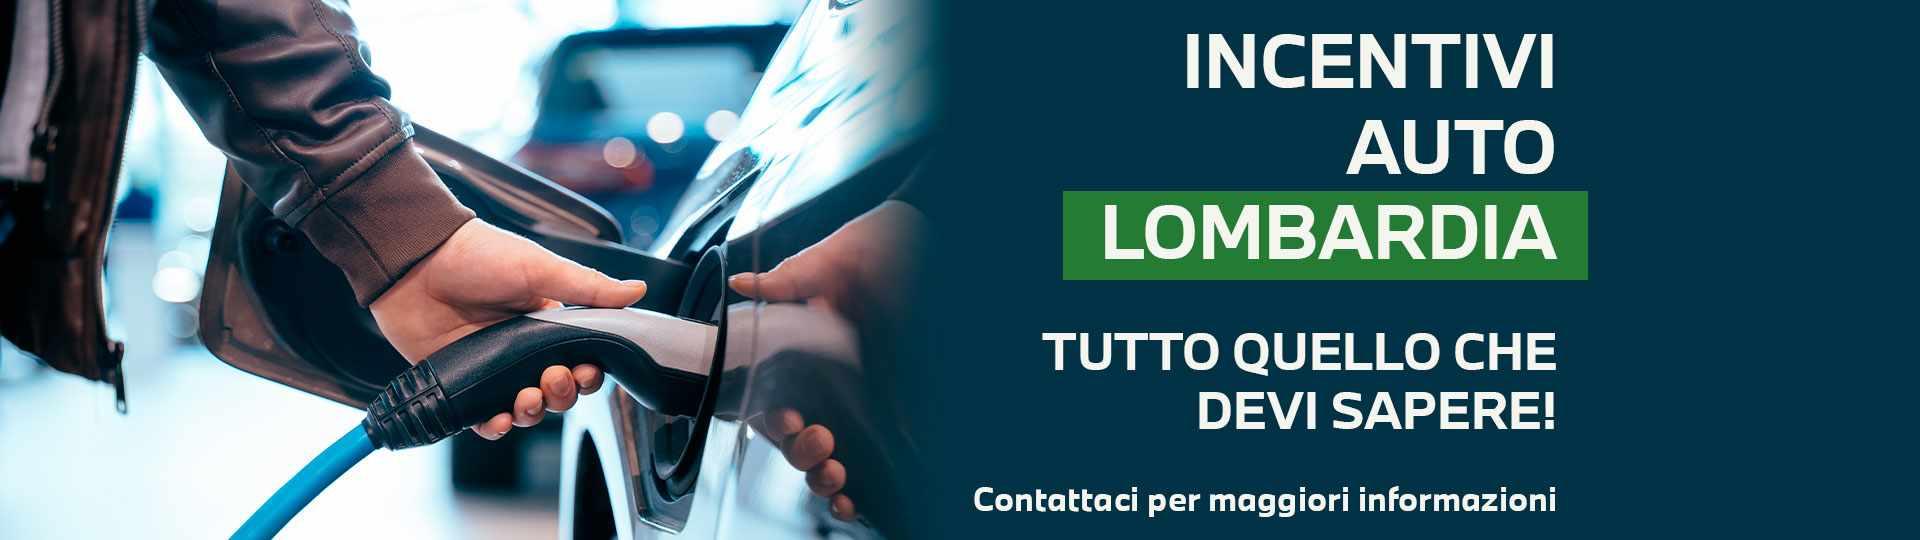 header_incentivi_lombardia_auto_ibride_2021.jpg